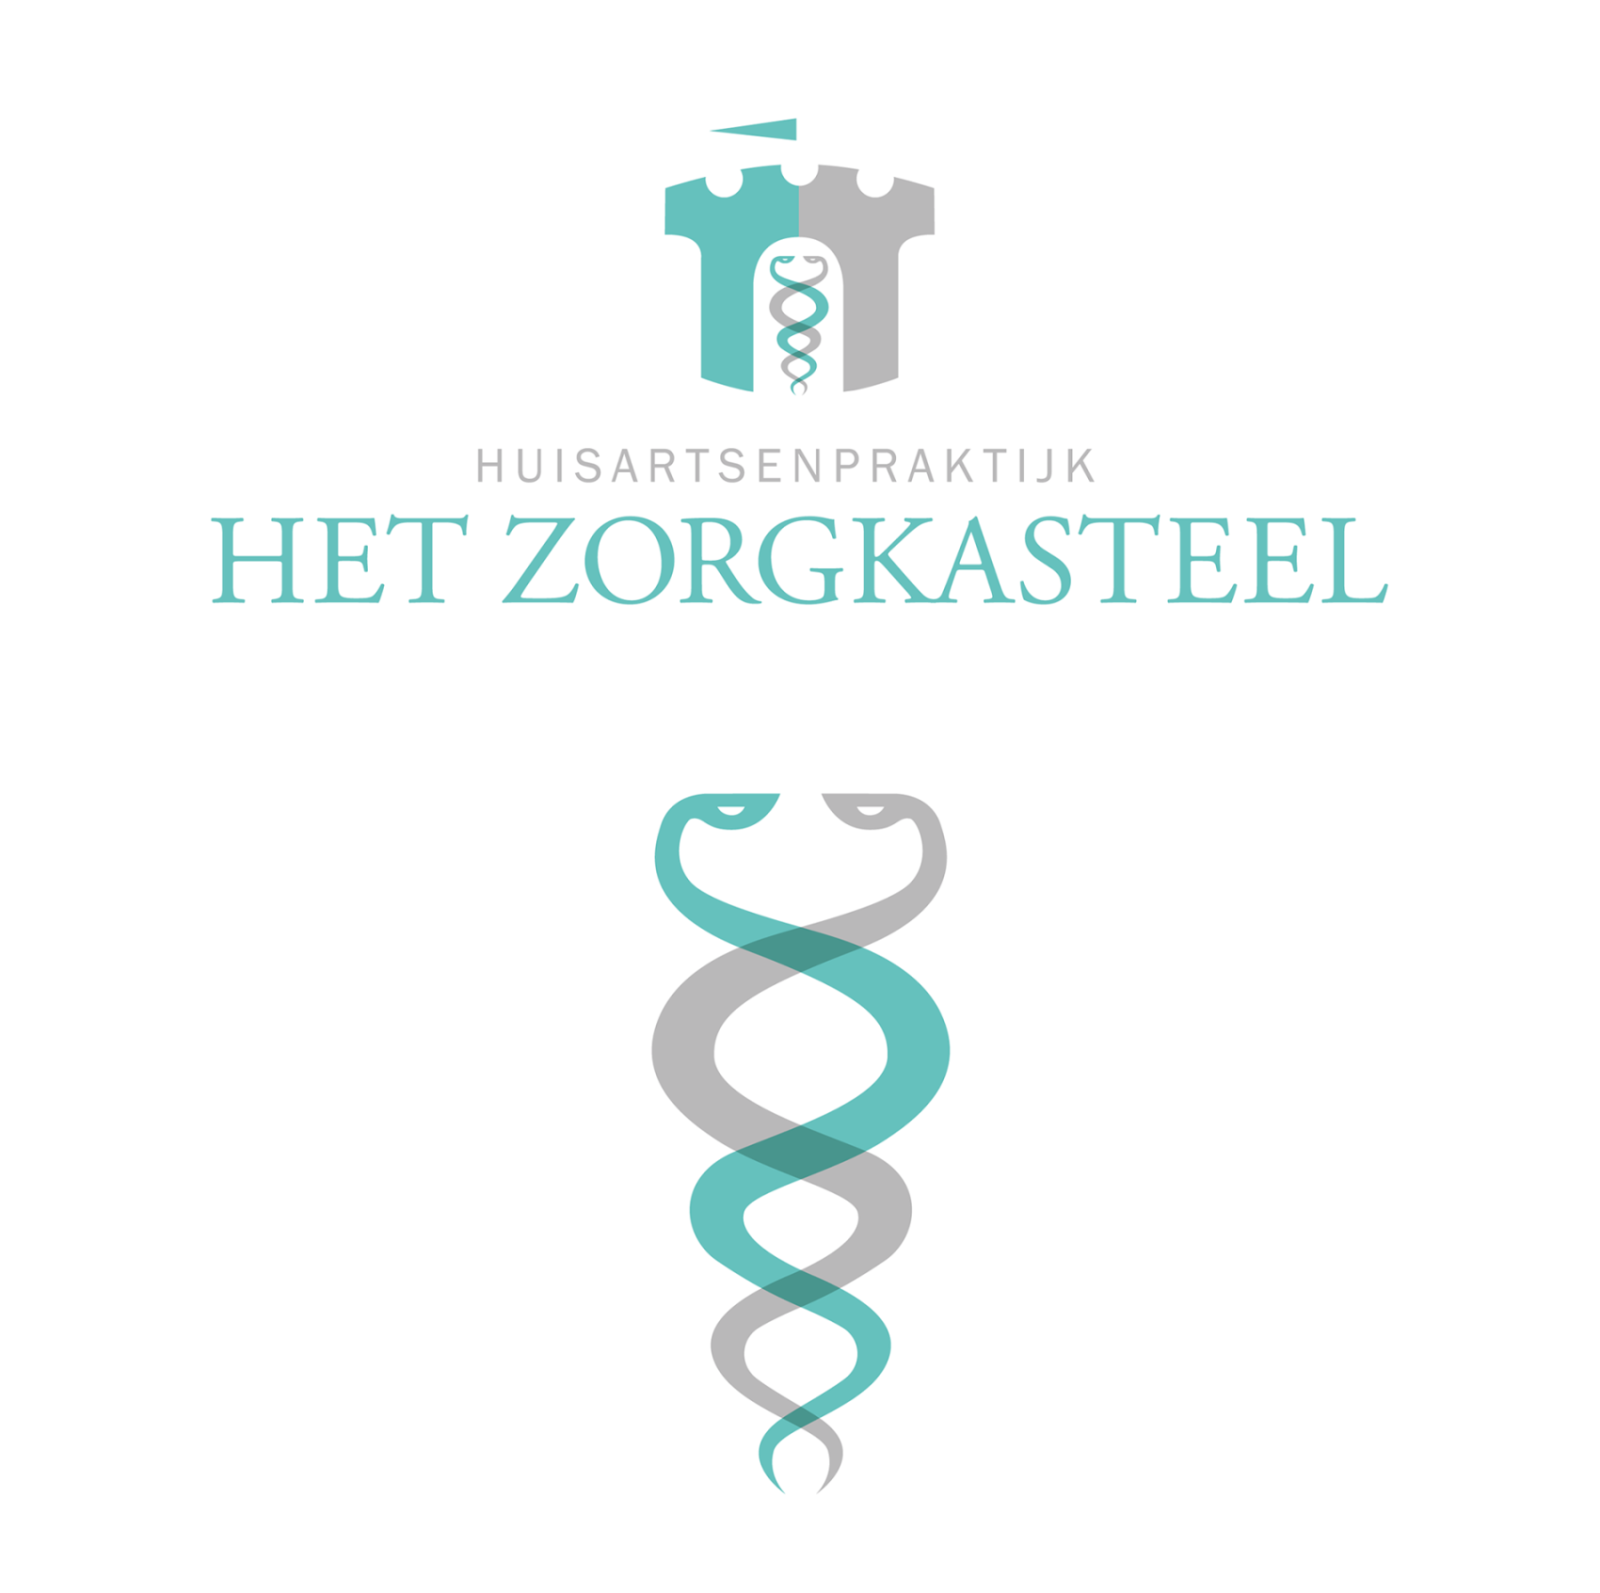 Zorgkasteel-logos